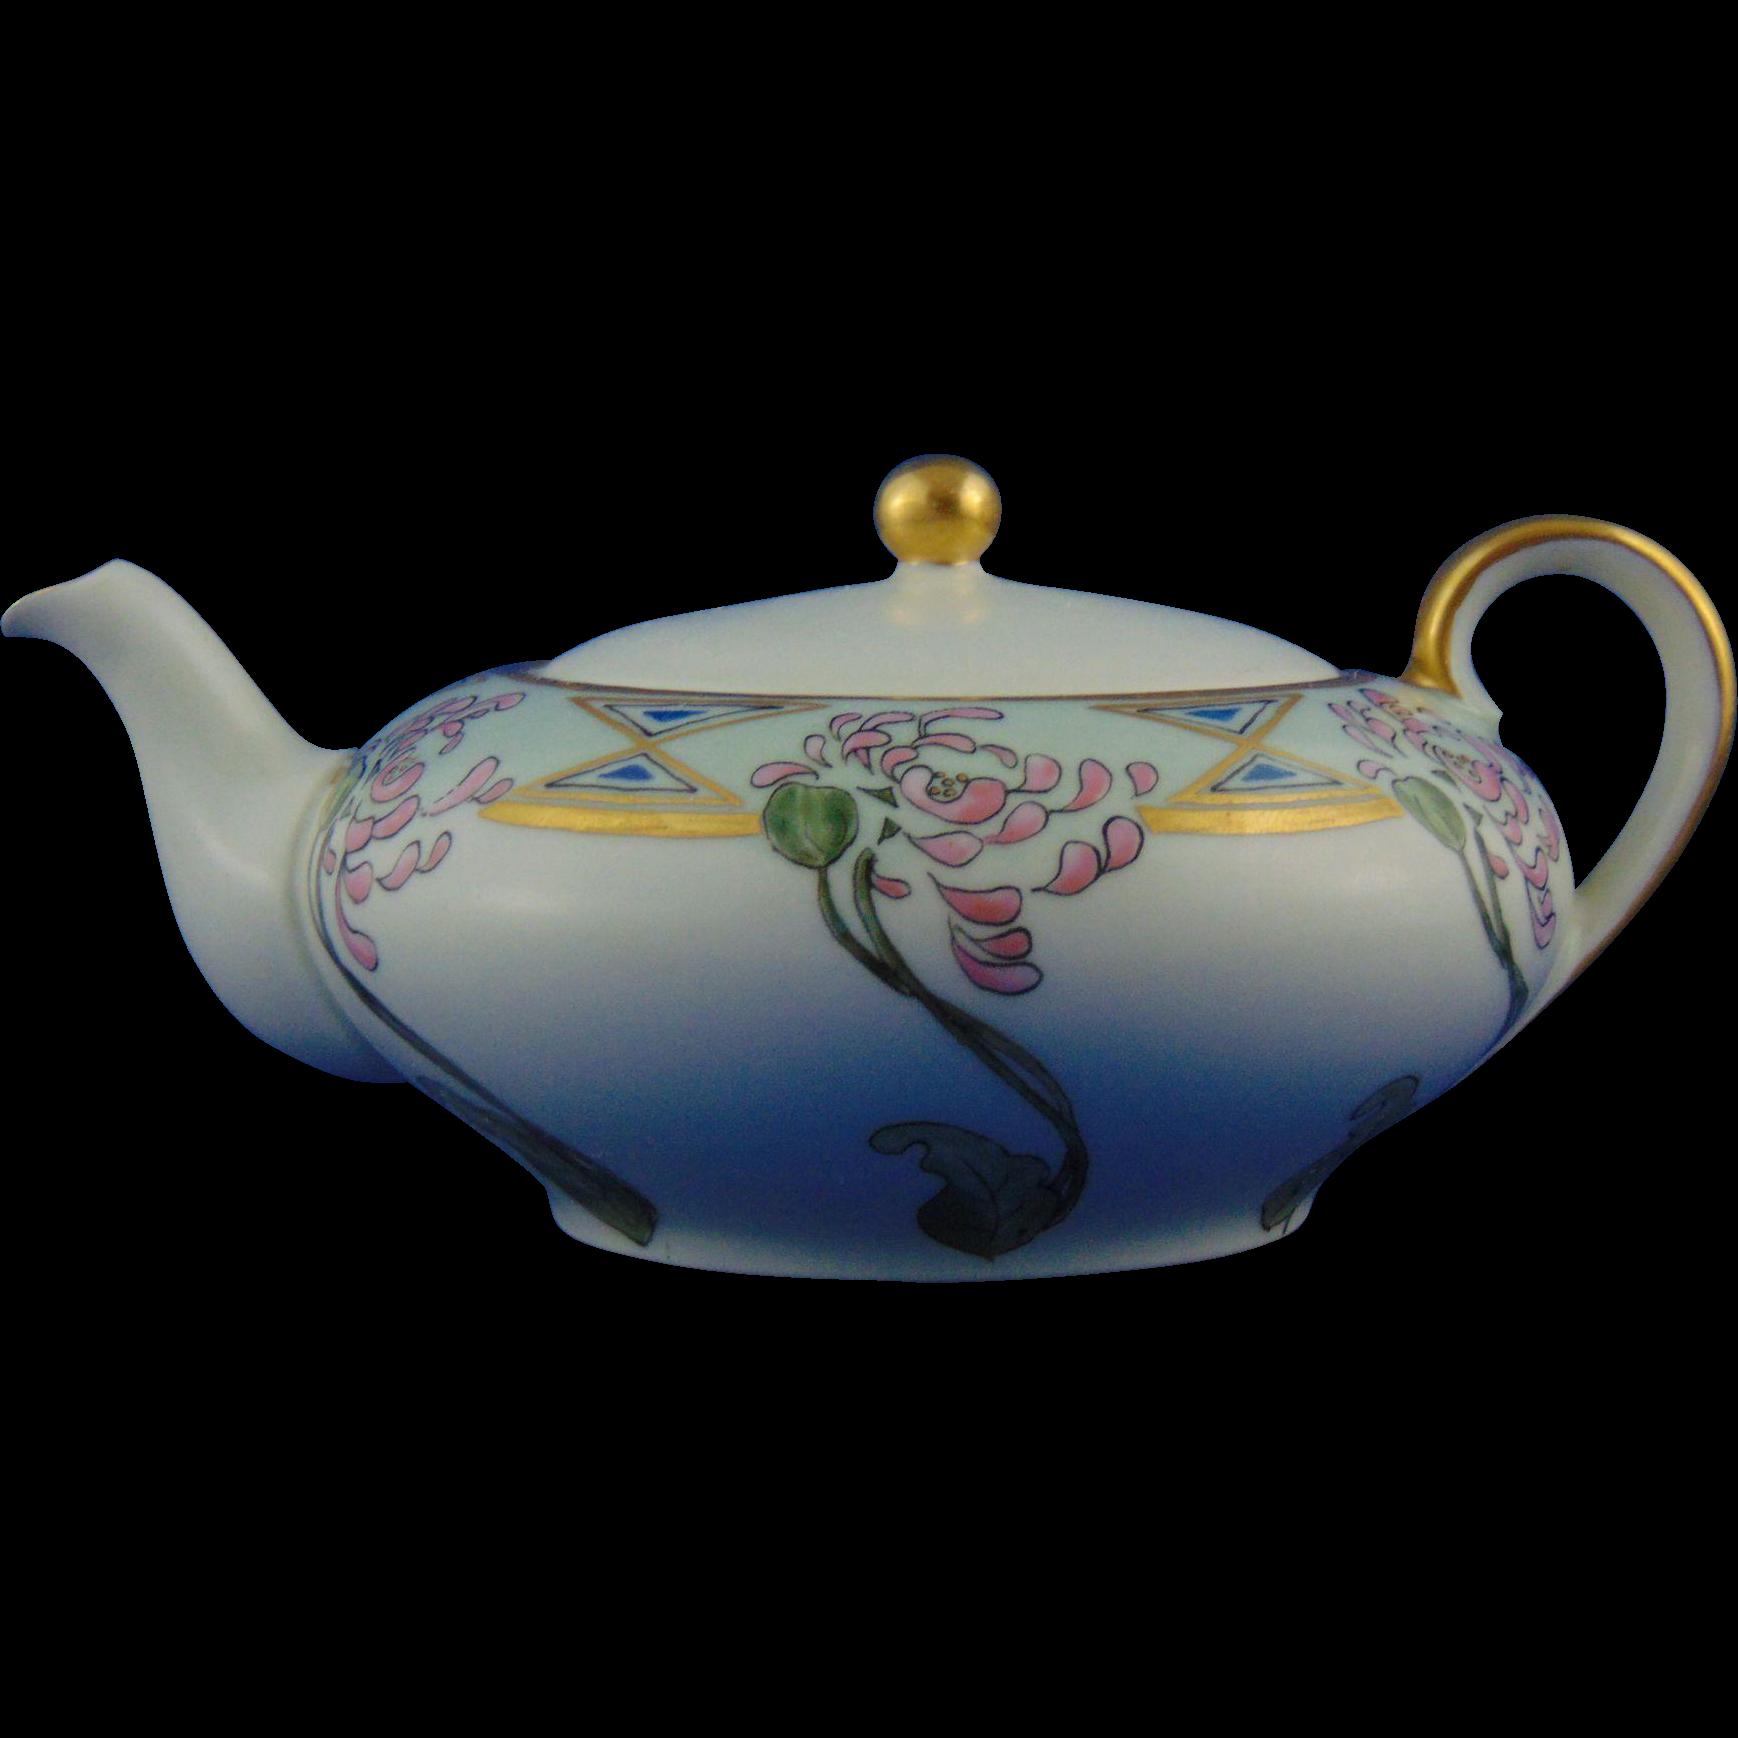 "Oscar & Edgar Gutherz (O&EG) Austria Arts & Crafts Floral Design Teapot (Signed ""M.R. Emerson""/c.1899-1918) - Keramic Studio Design"